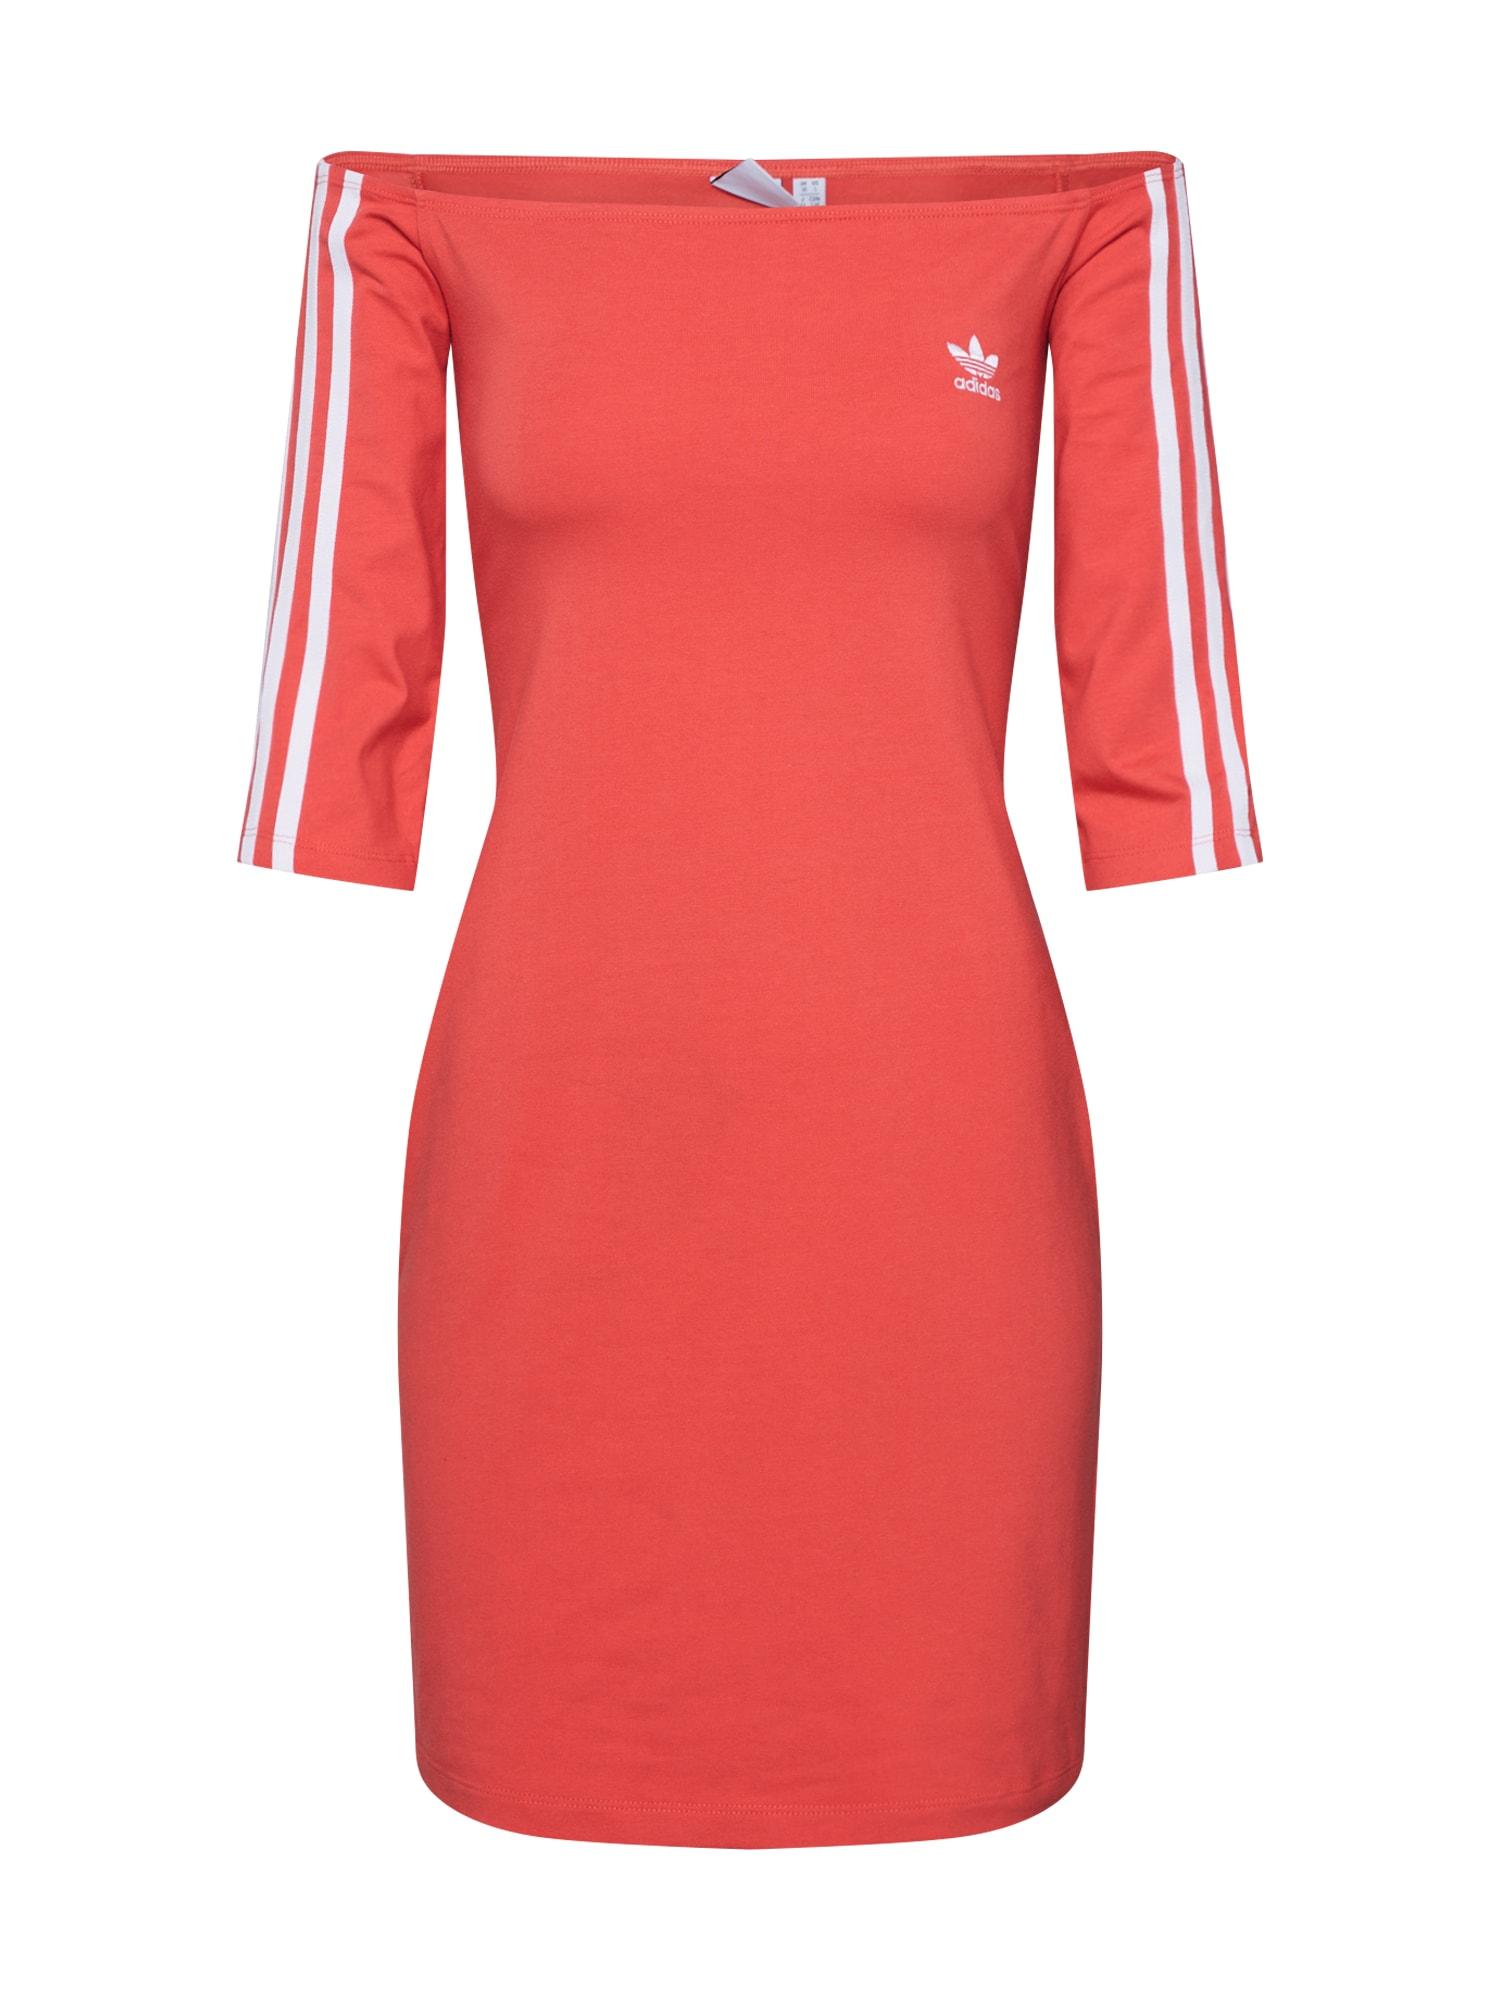 ADIDAS ORIGINALS Šaty  červená